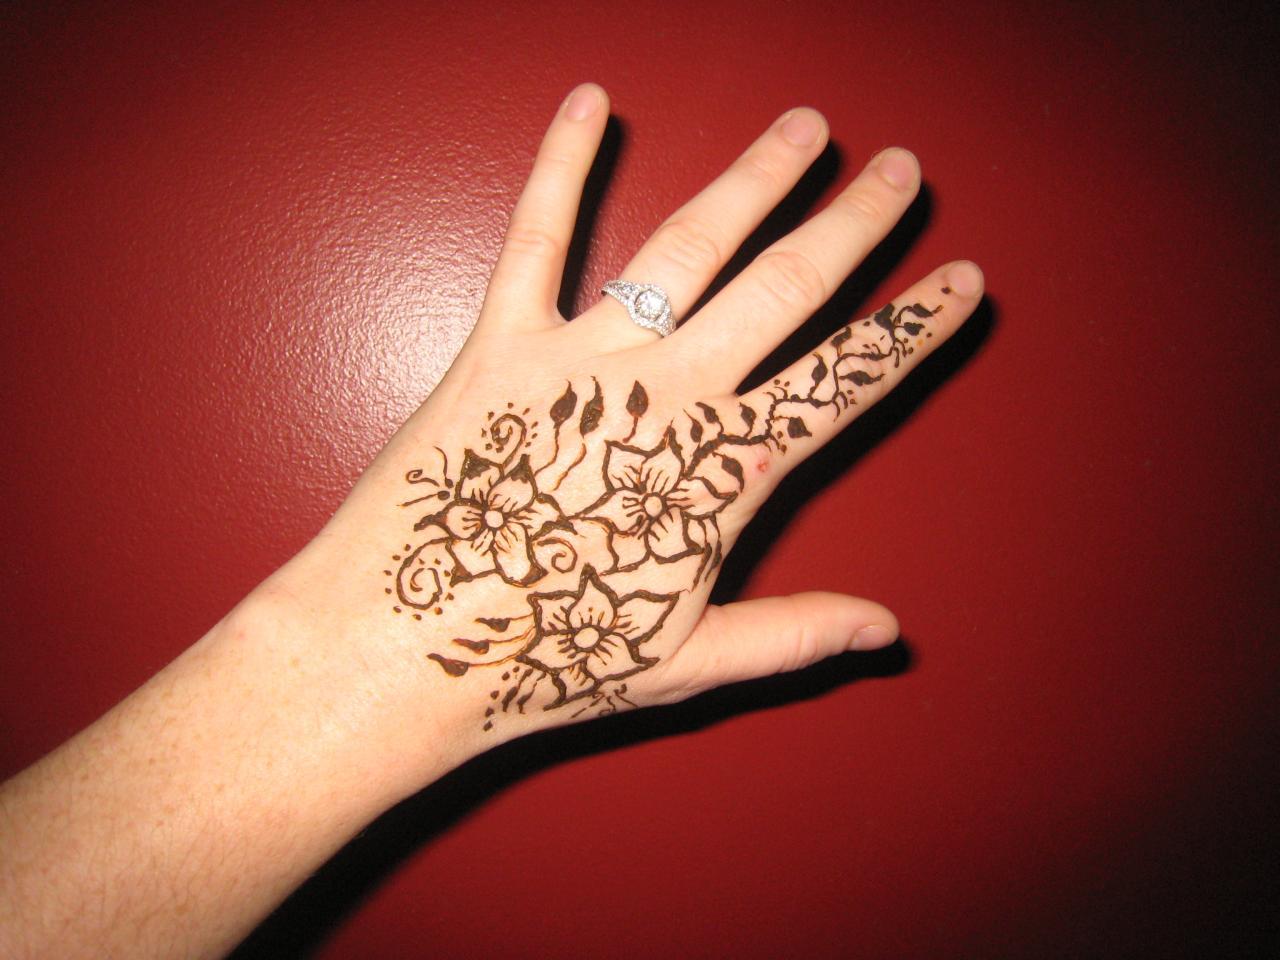 Cool Henna Tattoo Designs: Henna Tatoo Designs